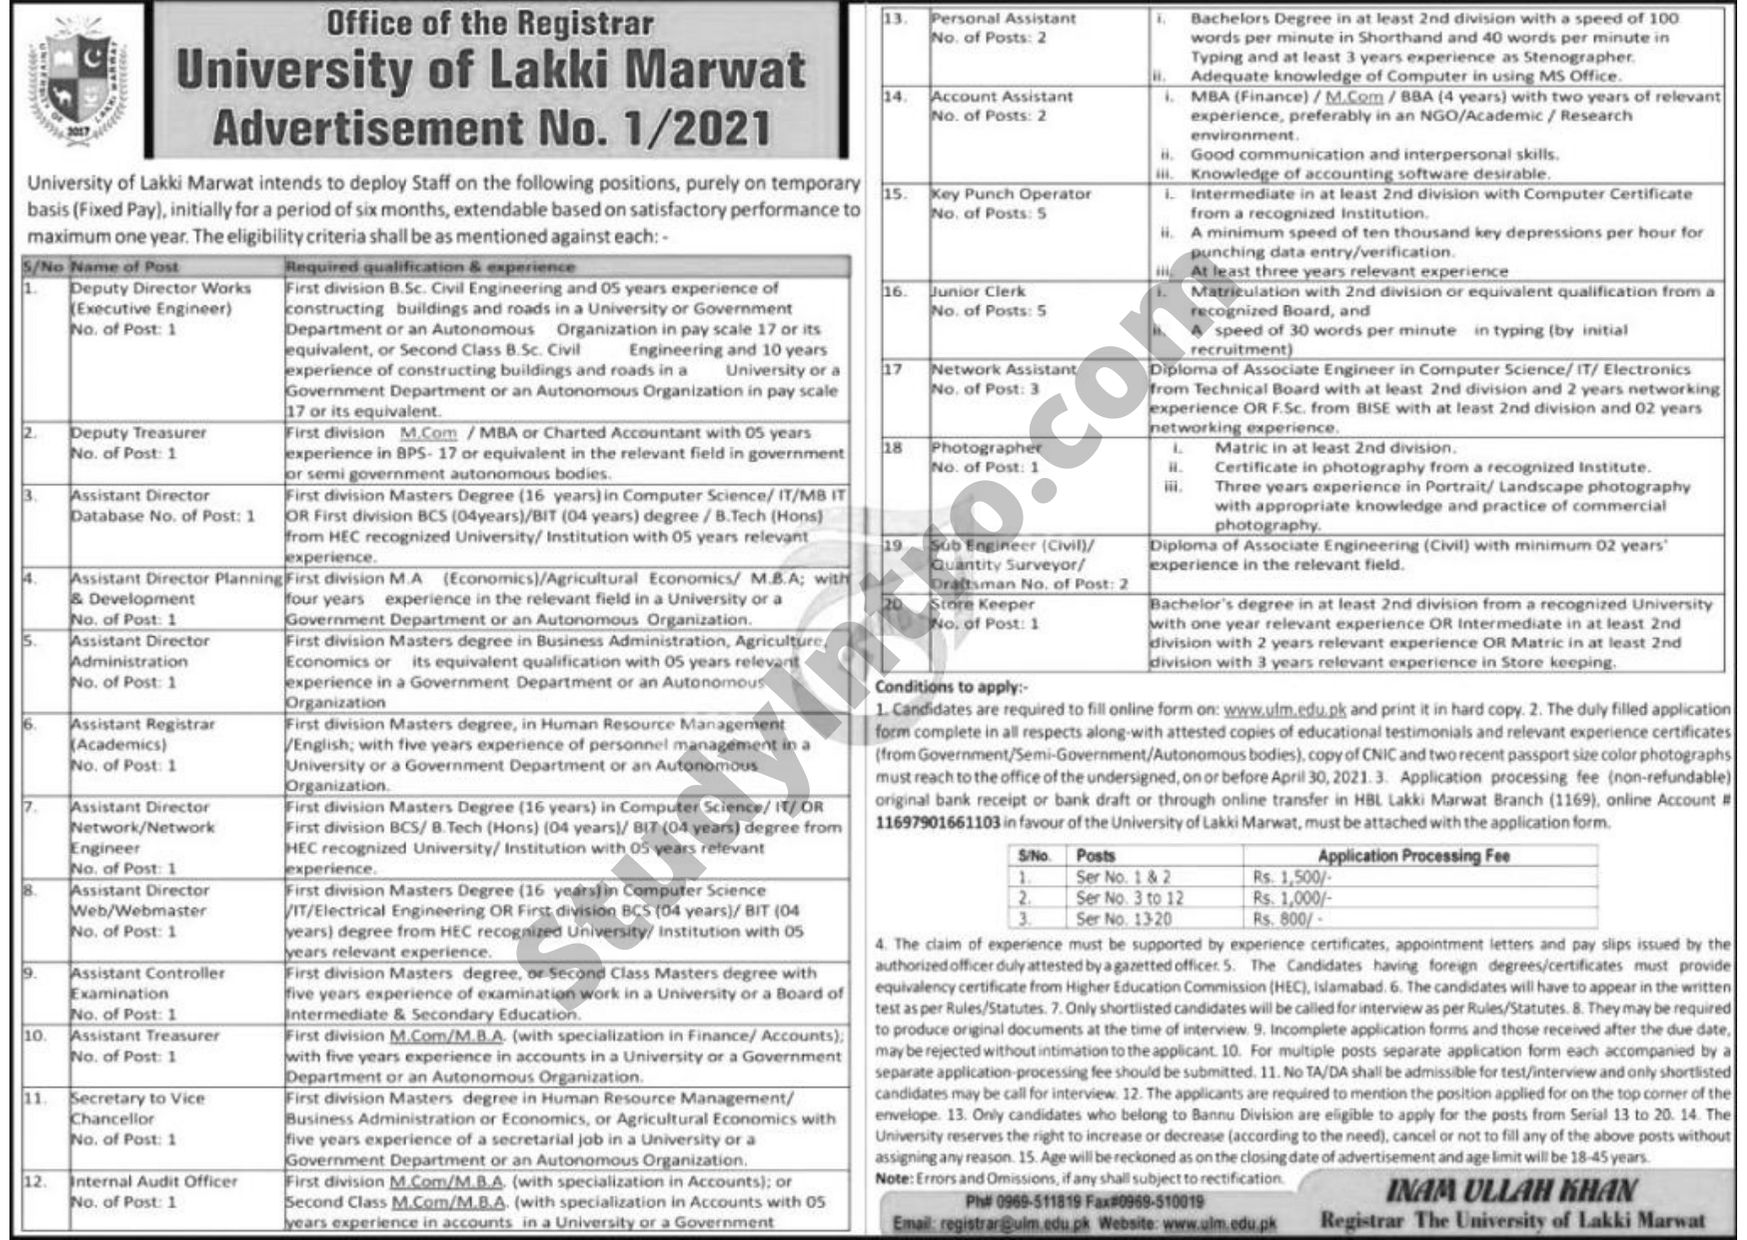 Government Jobs in University of Lakki Marwat